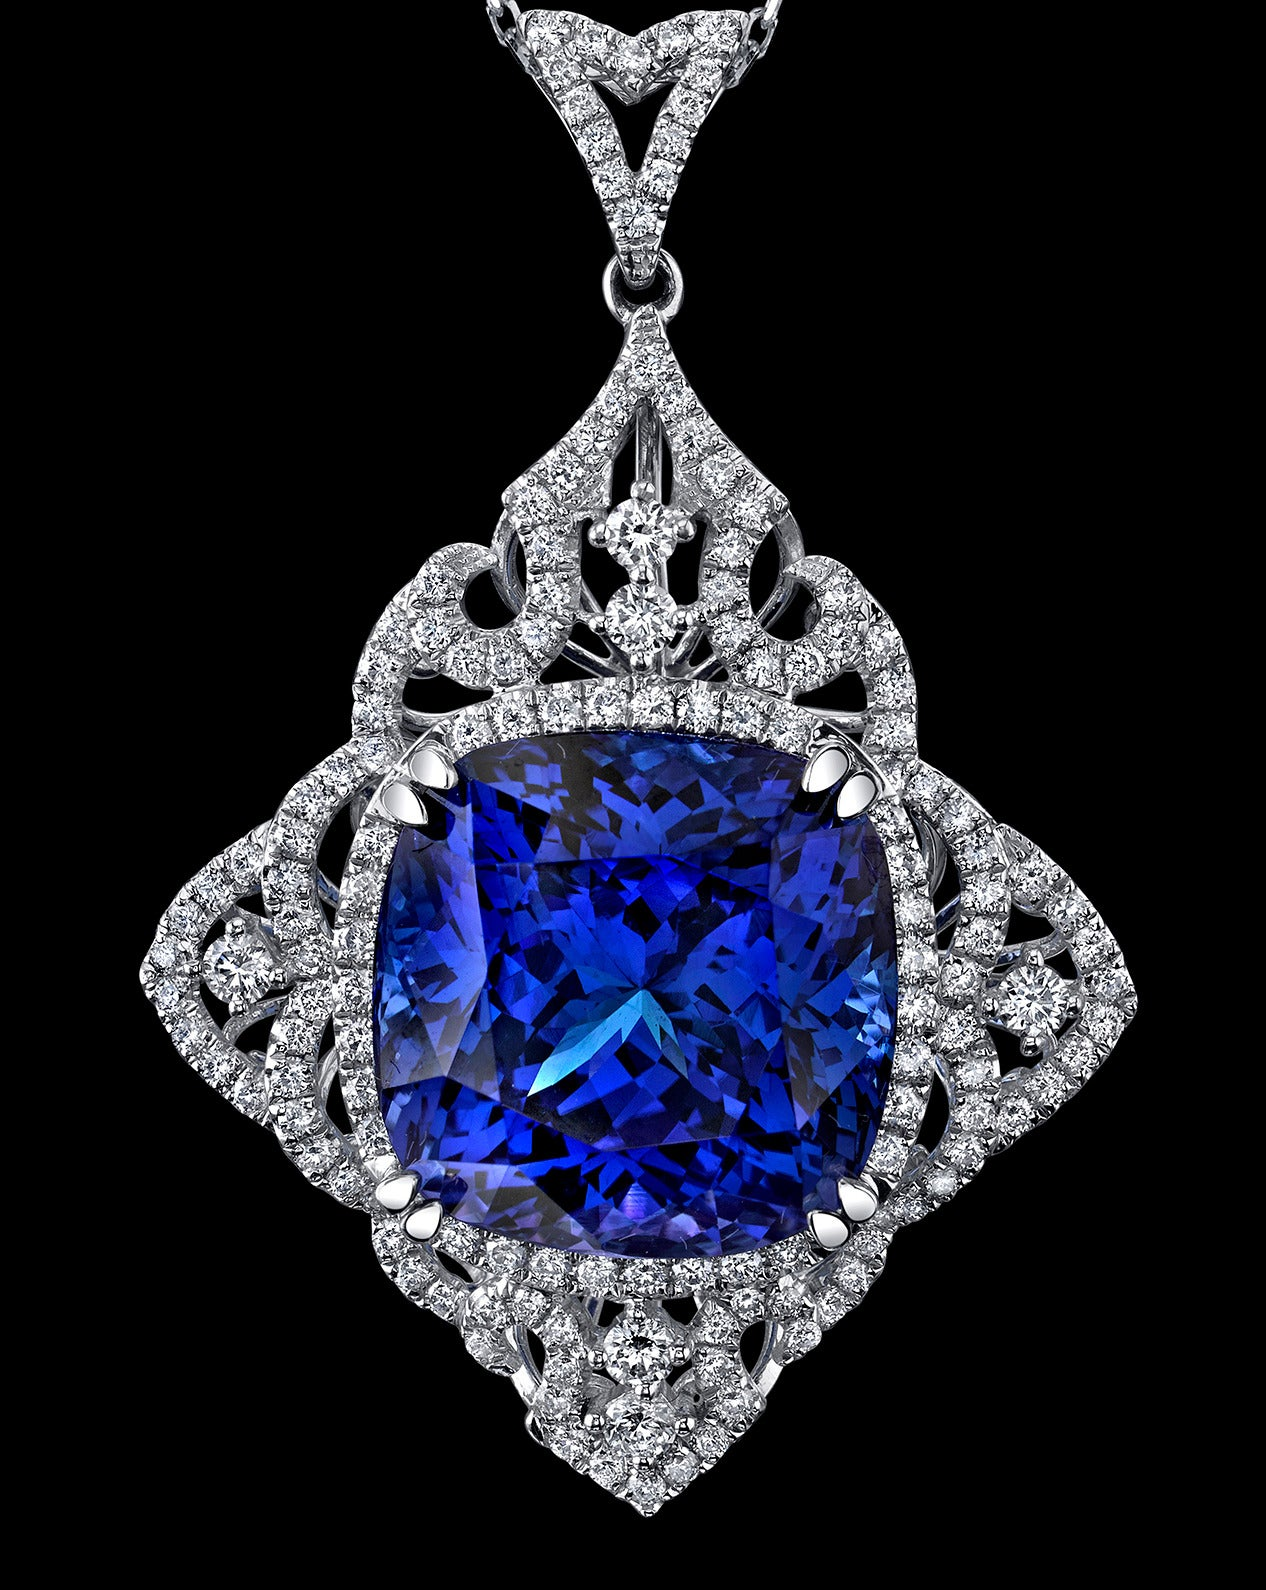 Sensational 29.51 Carat Cushion Cut Tanzanite Diamond Gold Pendant Necklace 2